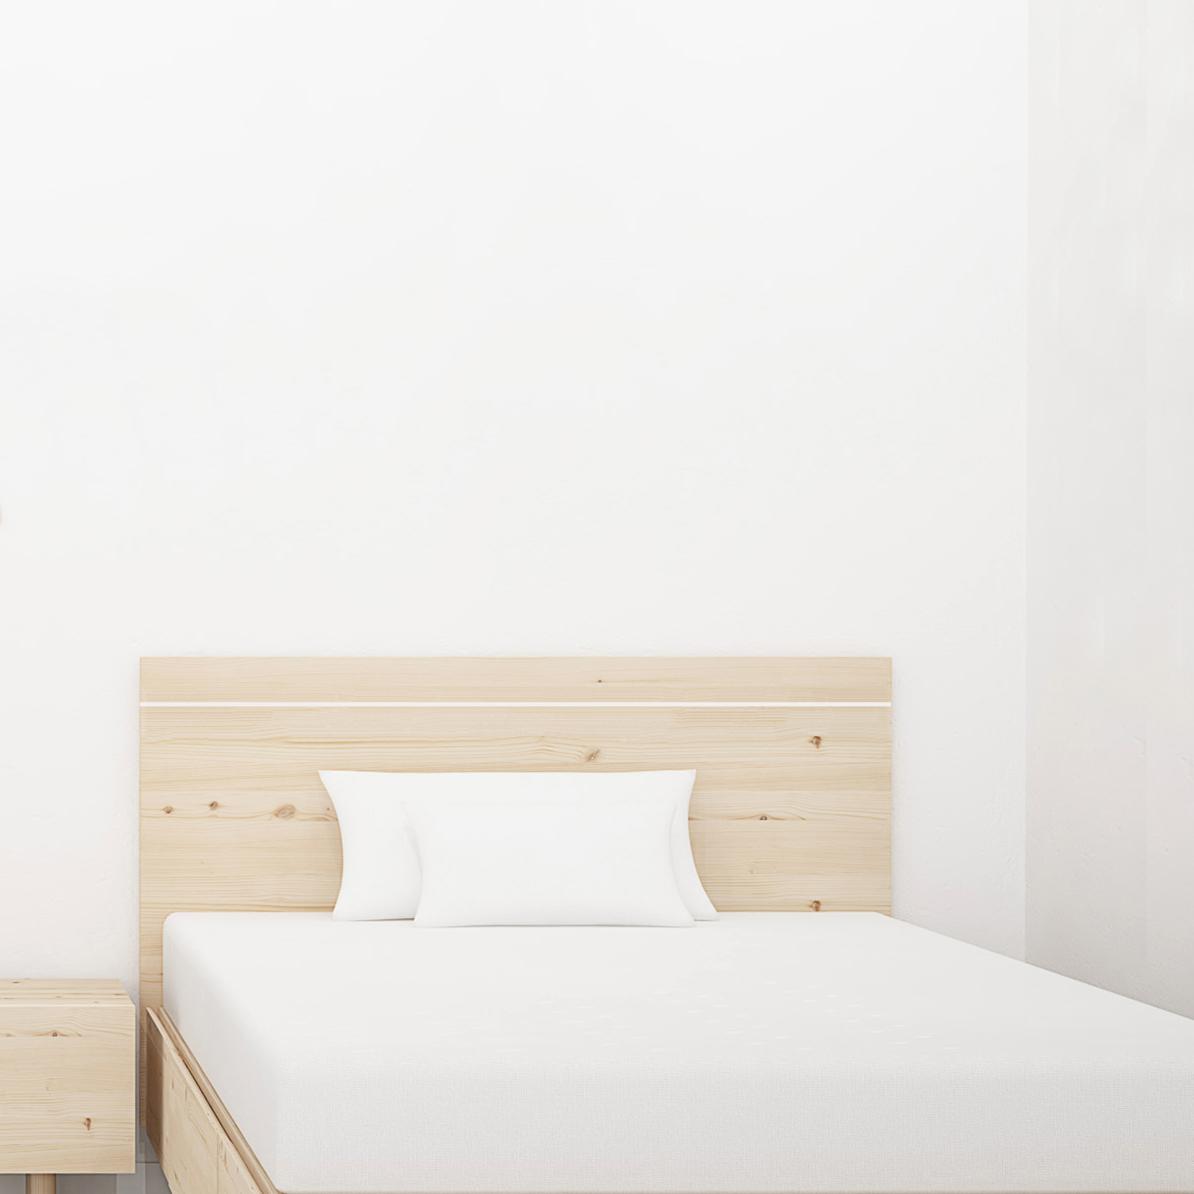 cabezal dormitorio infantil madera natural